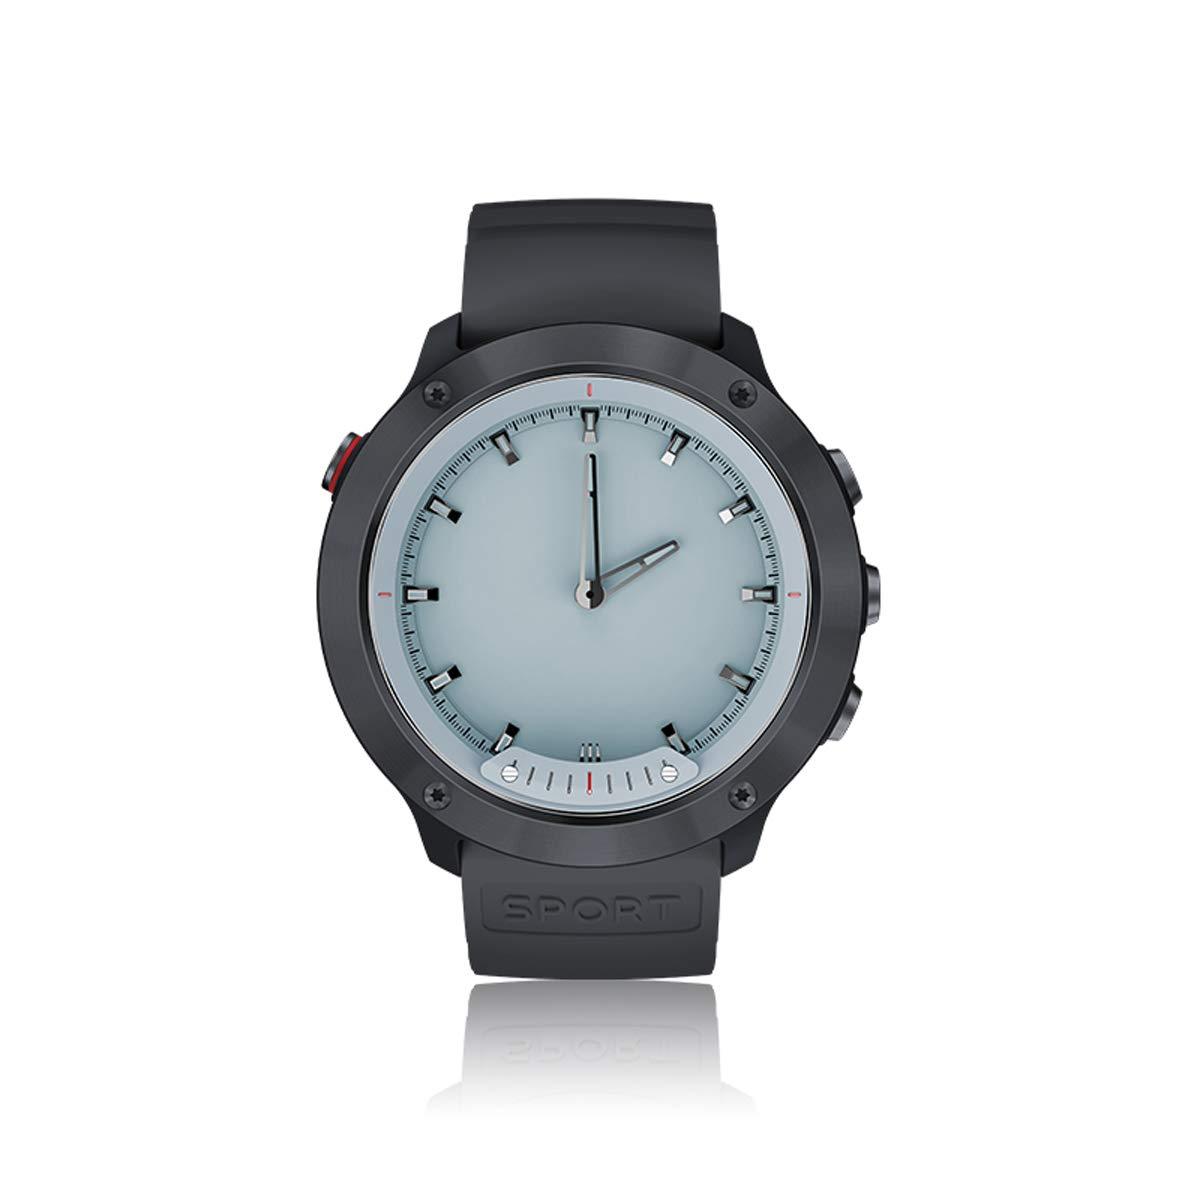 Amazon.com : TGAX M5 Hybrid Smart Watch Sports Smartwatch ...